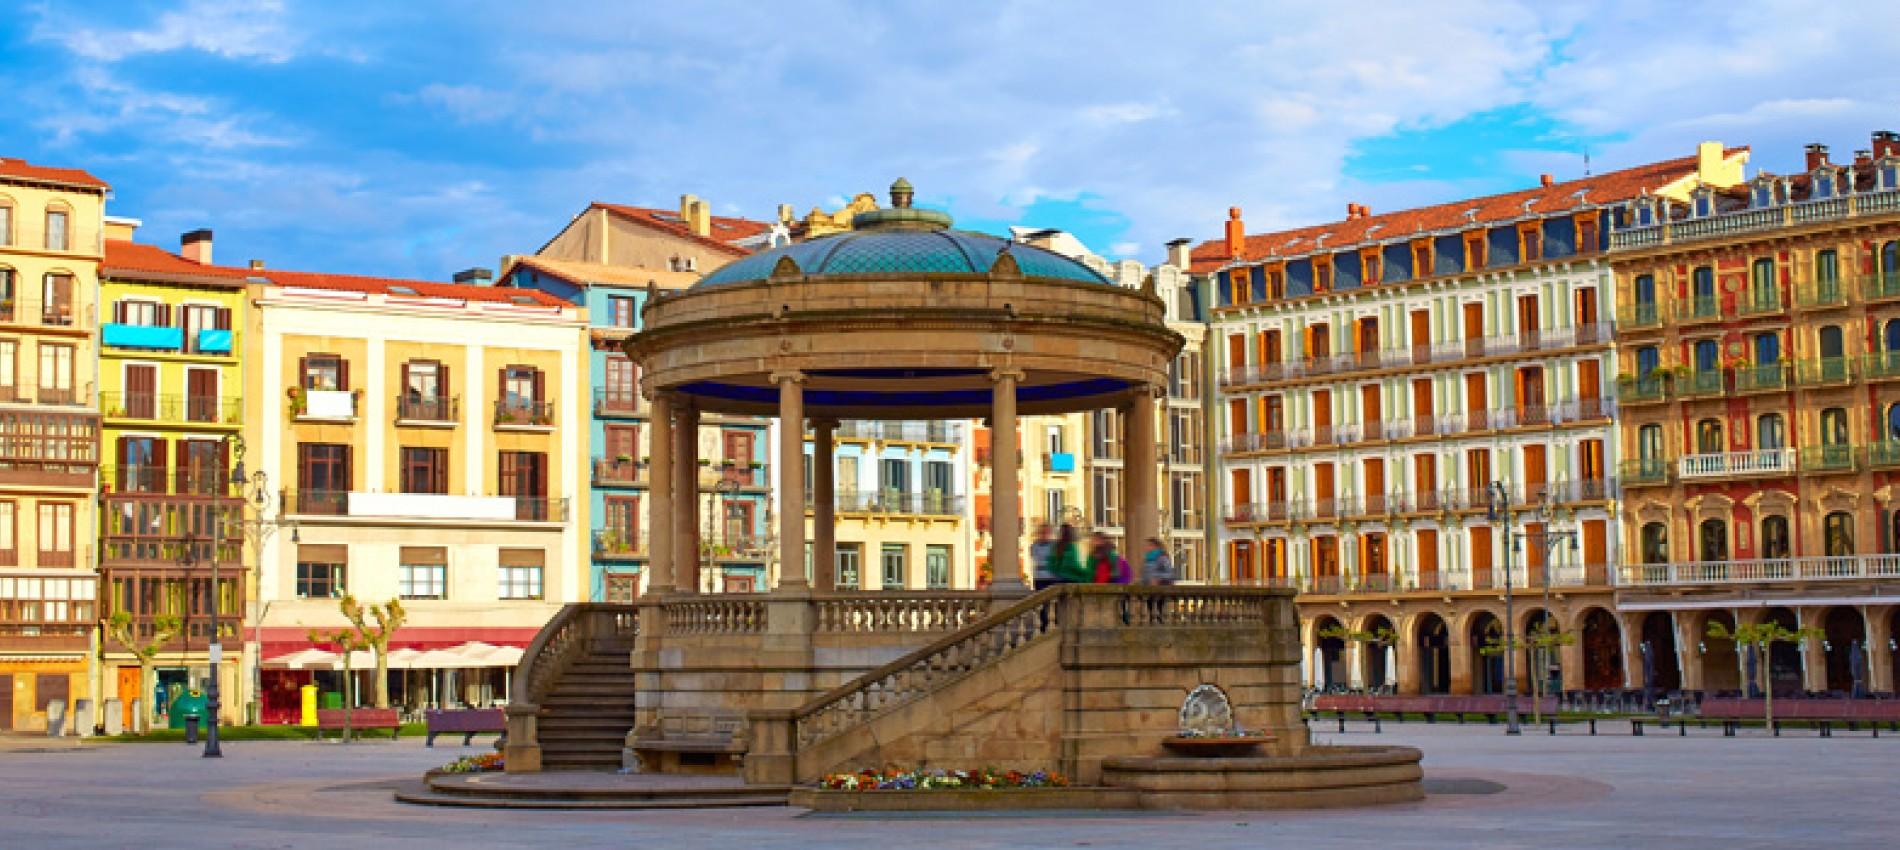 Pamplona chemin saint jacques